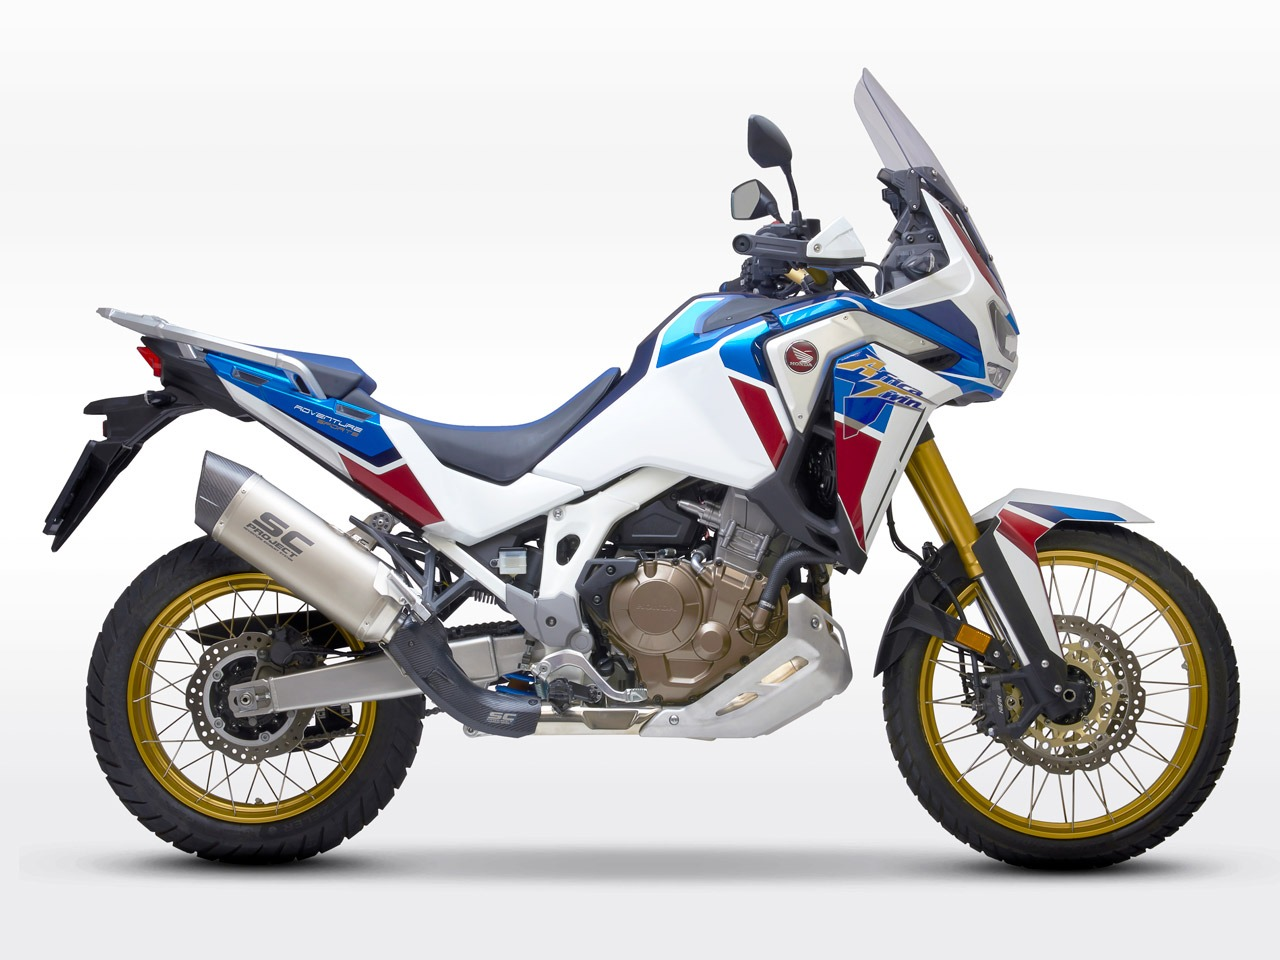 Honda_CRF1100L-AfricaTwin_my2021_Adventure-Titanio_Lato_1280x960px_web-partnership